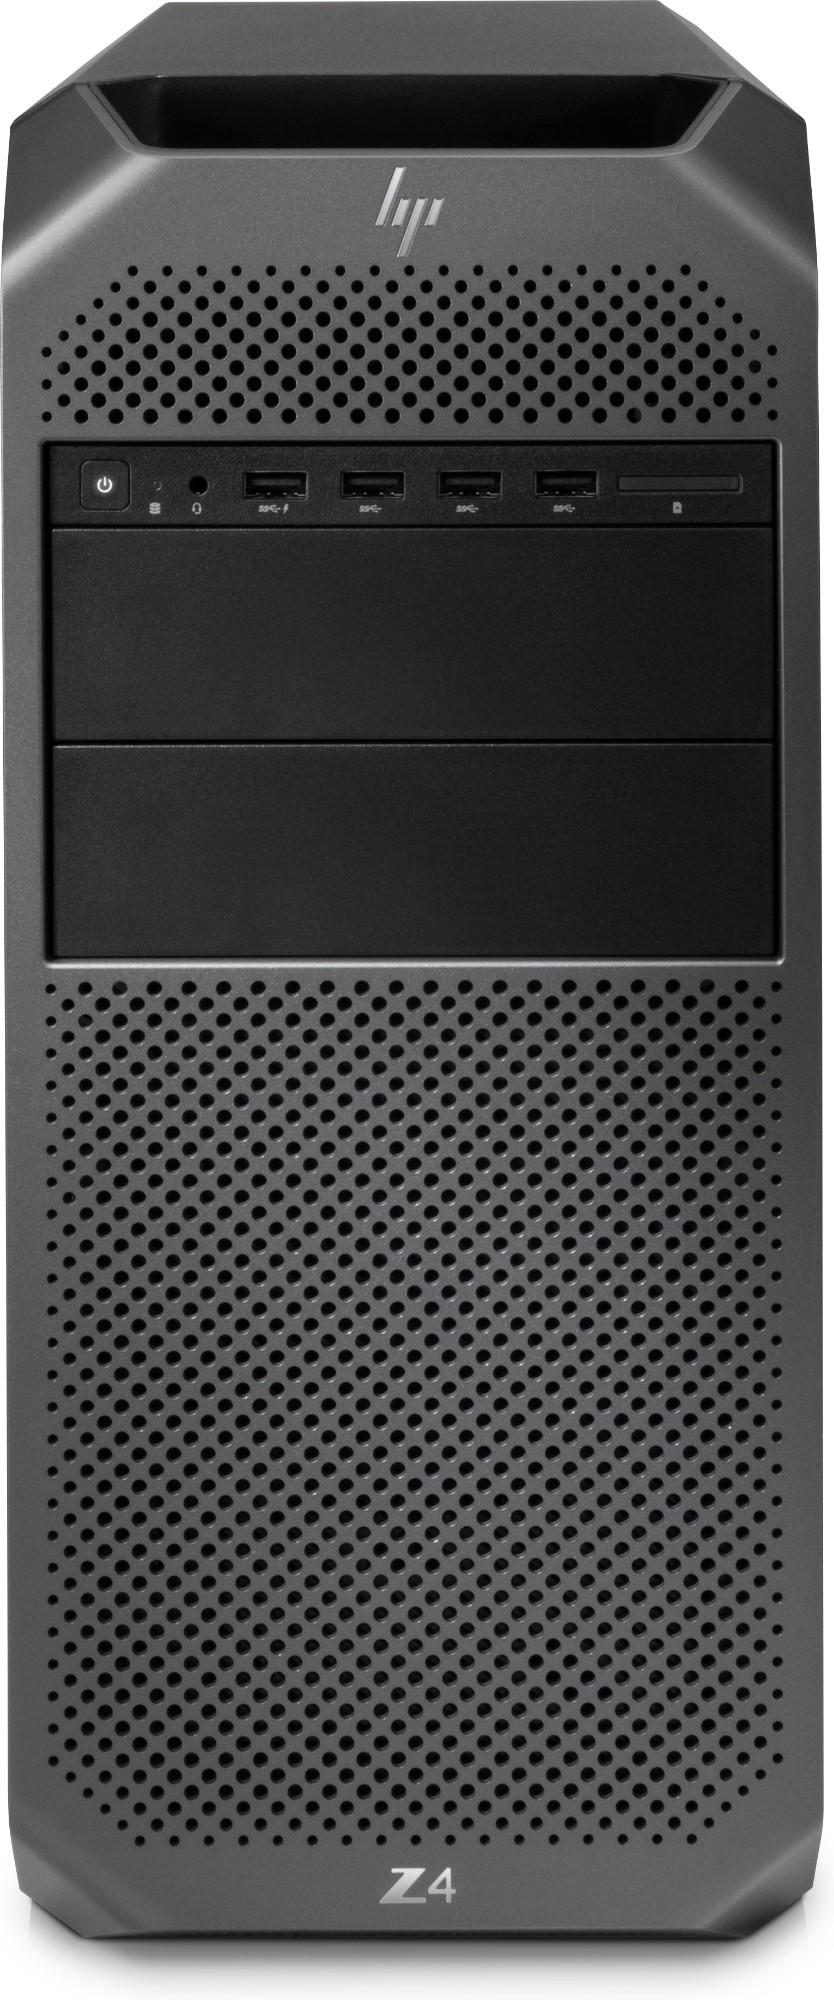 HP Z4 G4 Intel Xeon W W-2125 32 GB DDR4-SDRAM 512 GB SSD Black Tower Workstation